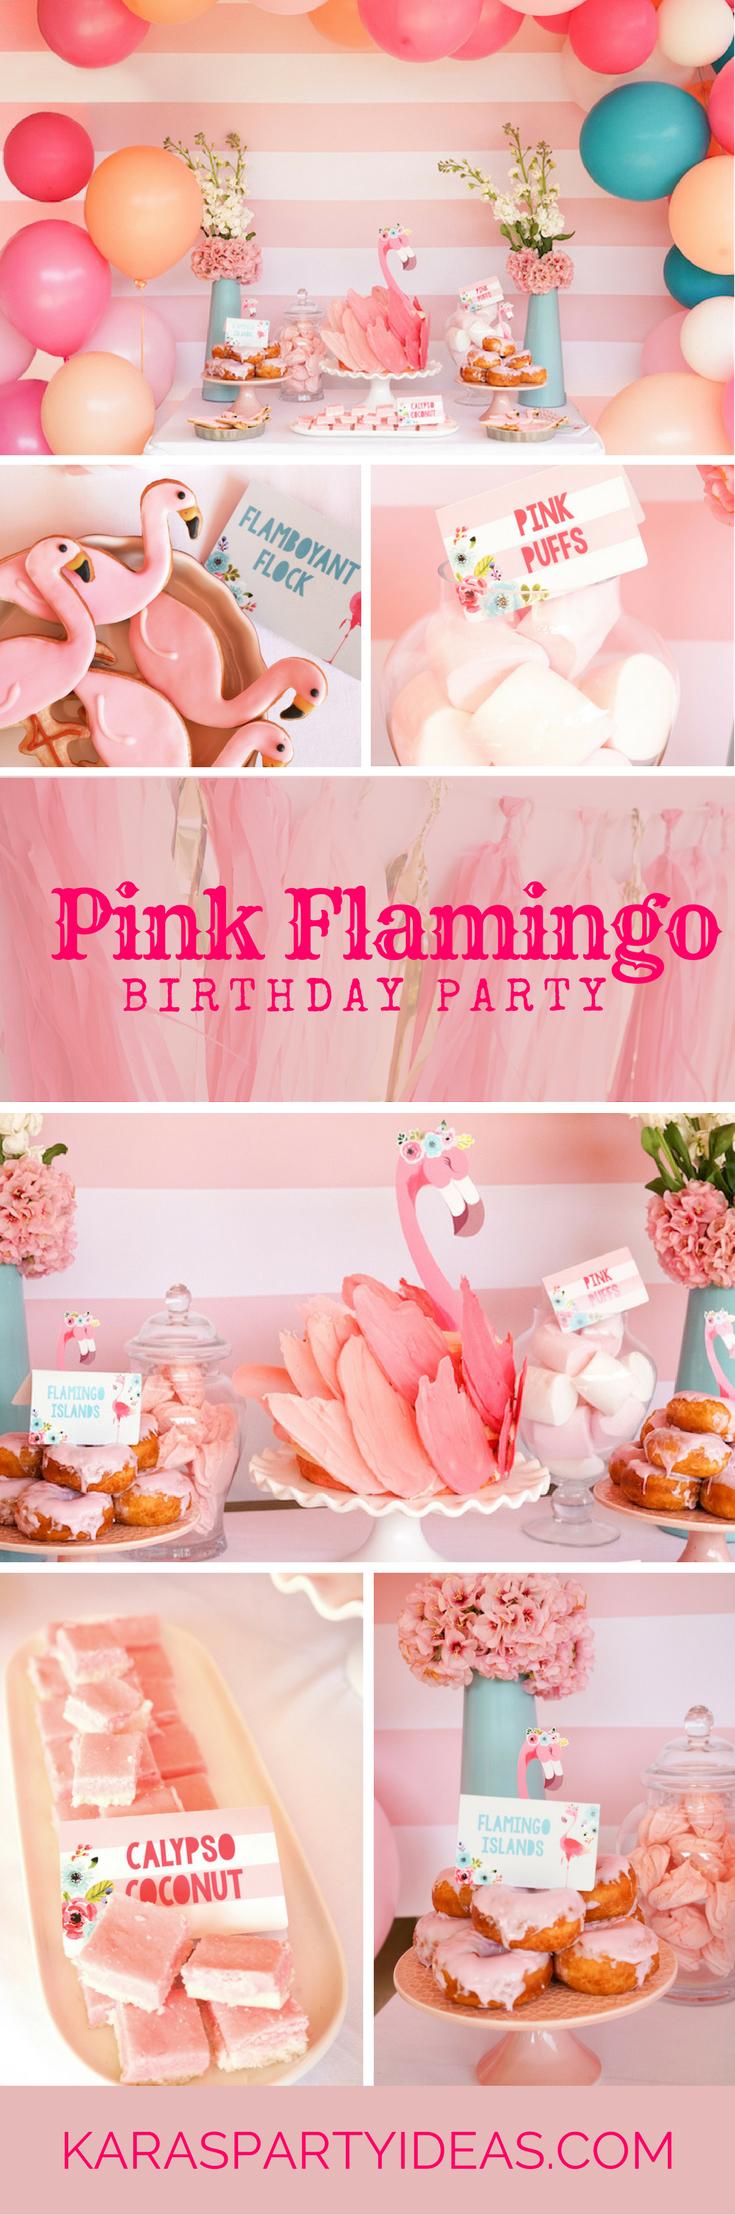 Pink Flamingo Birthday Party via Kara's Party Ideas - KarasPartyIdeas.com